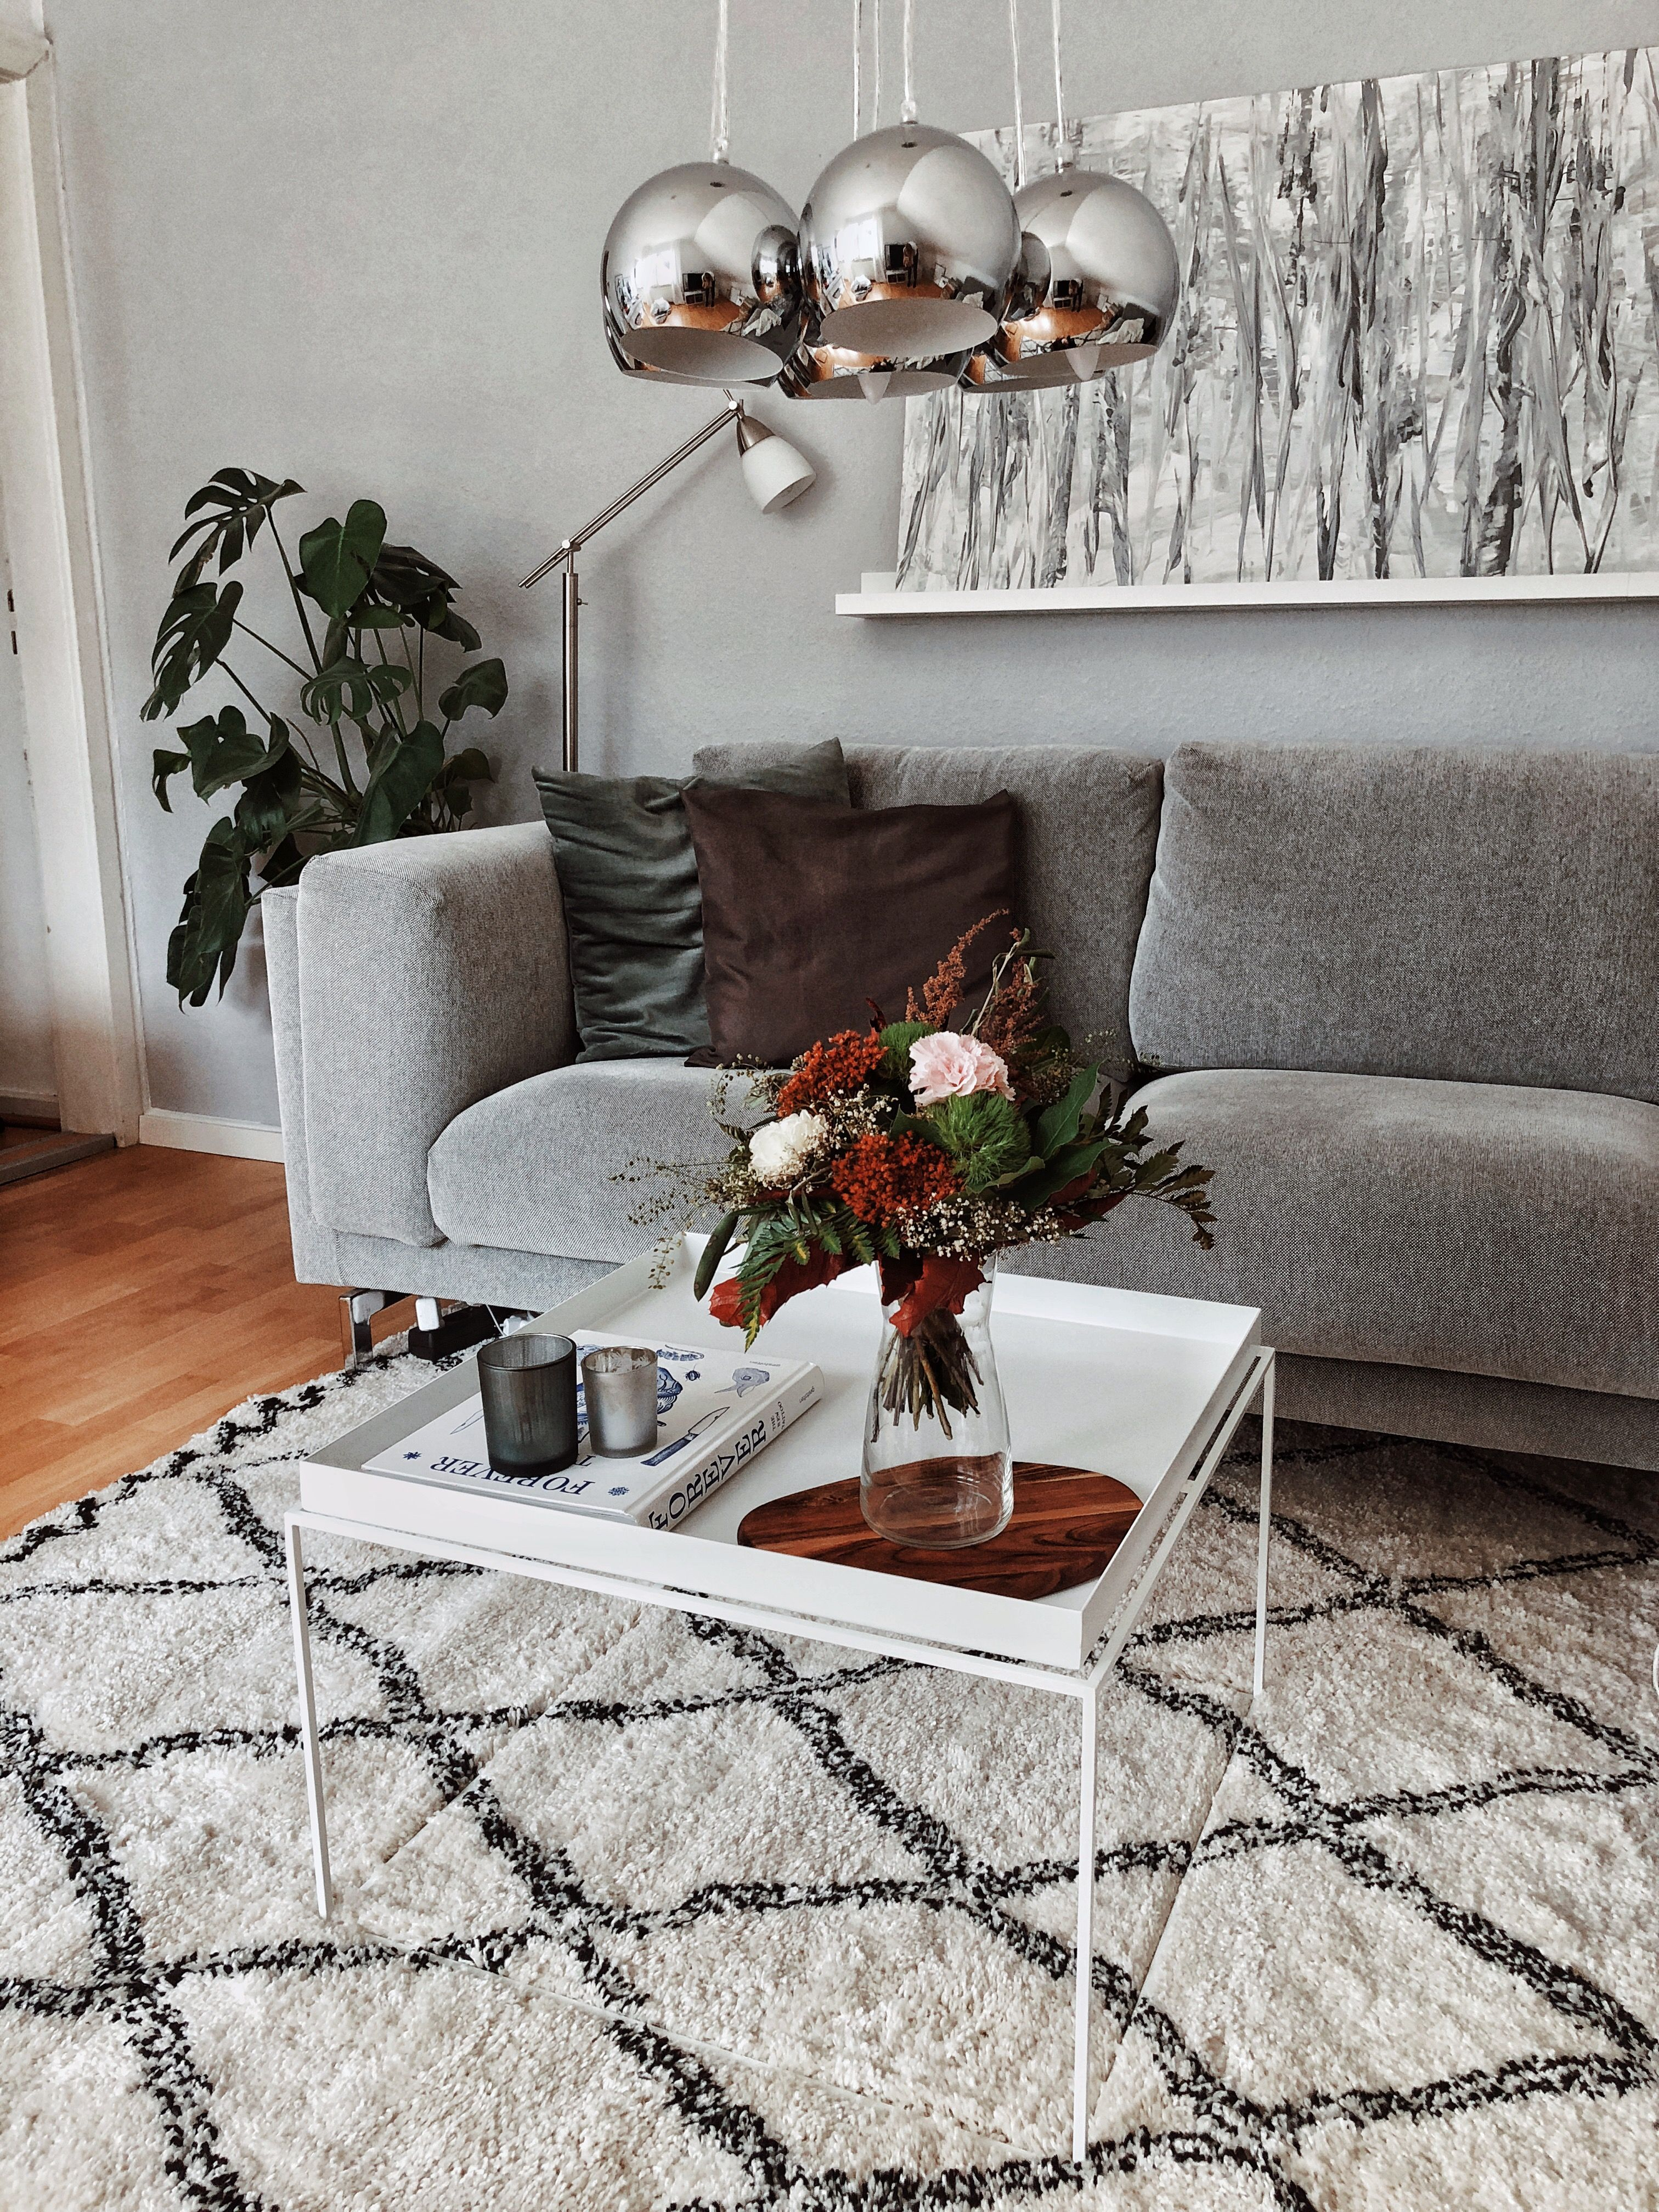 Wohnzimmer, Ikea, Livingroom, Hay, Hay Tray Table, Hay Tray Table Coffee